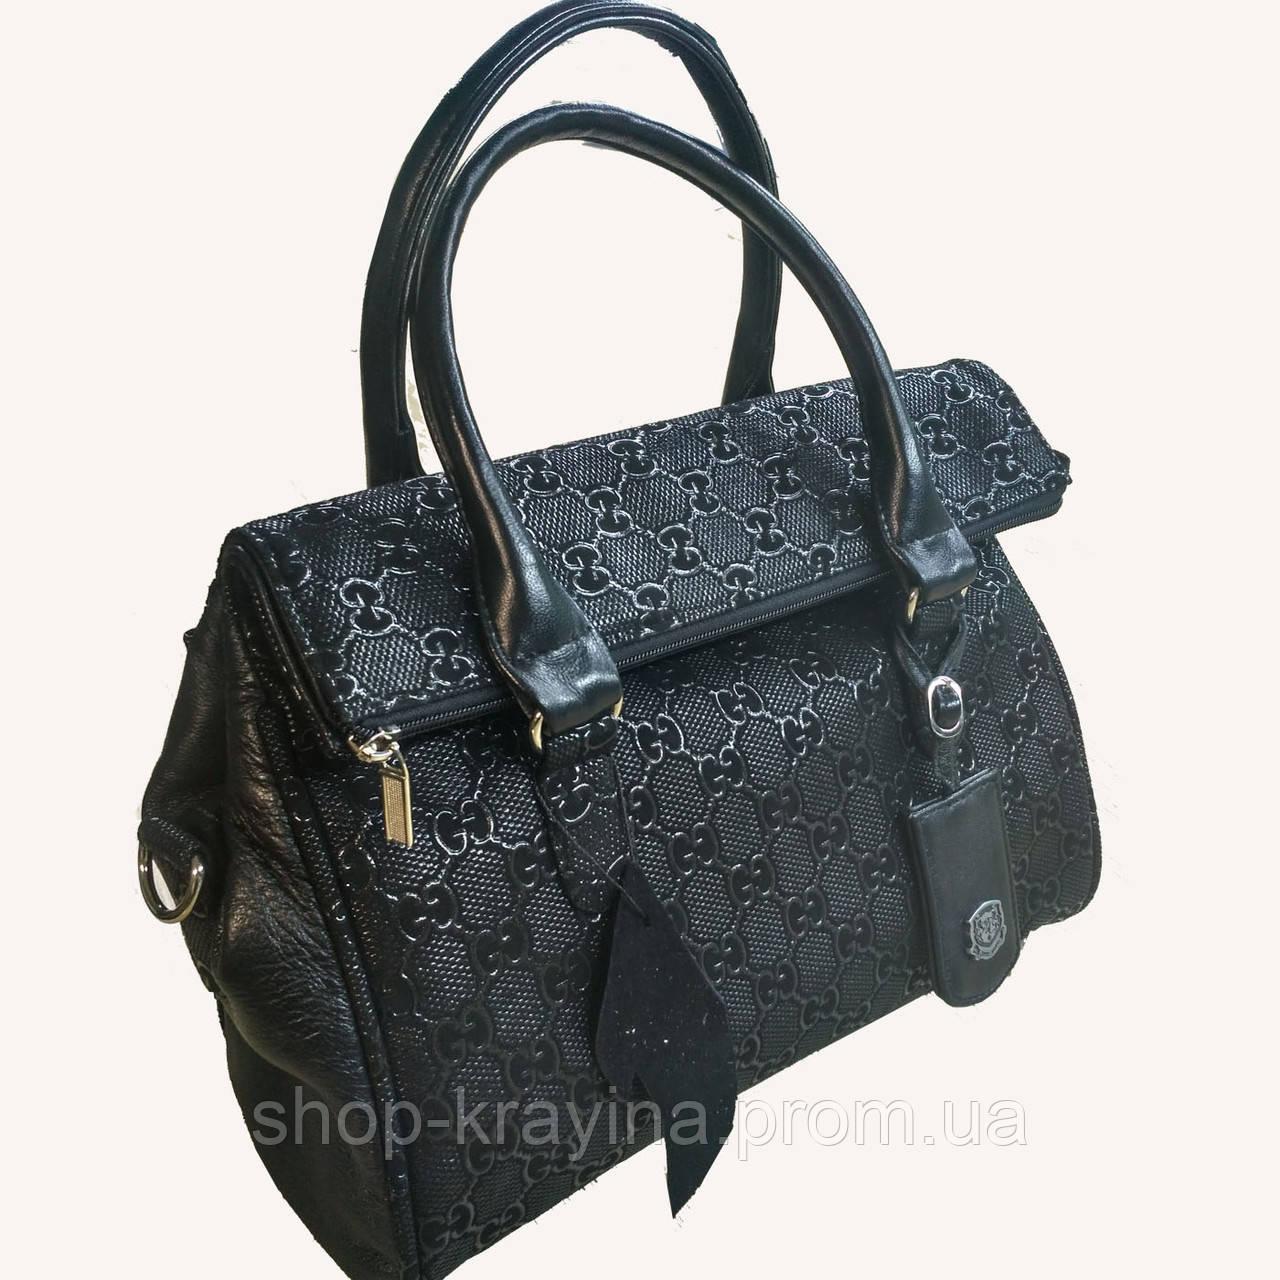 Кожаная сумка leather  black 25*30*10 см